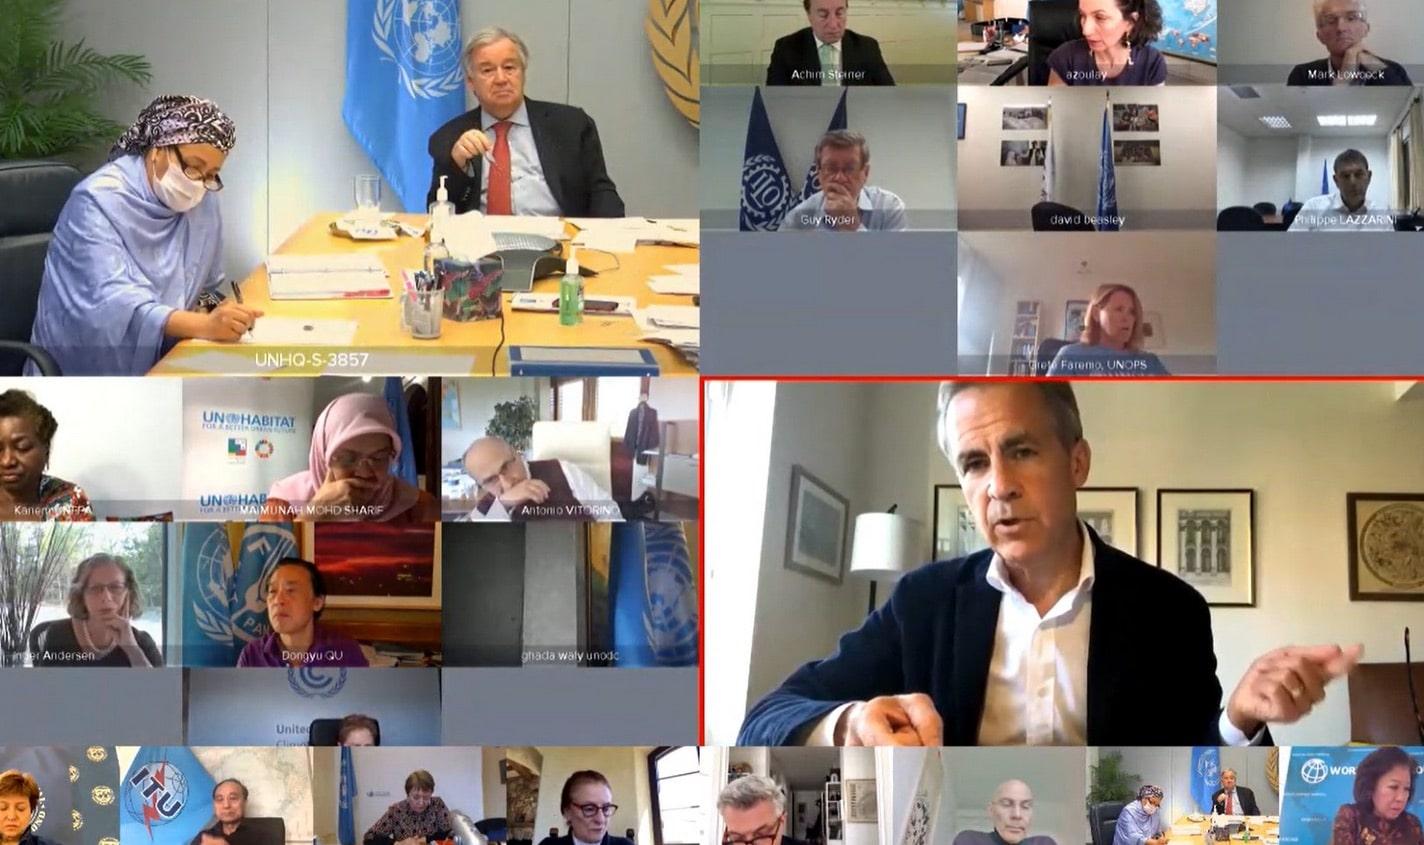 Image from a tweet by UN Deputy Secretary-General Amina J Mohammed